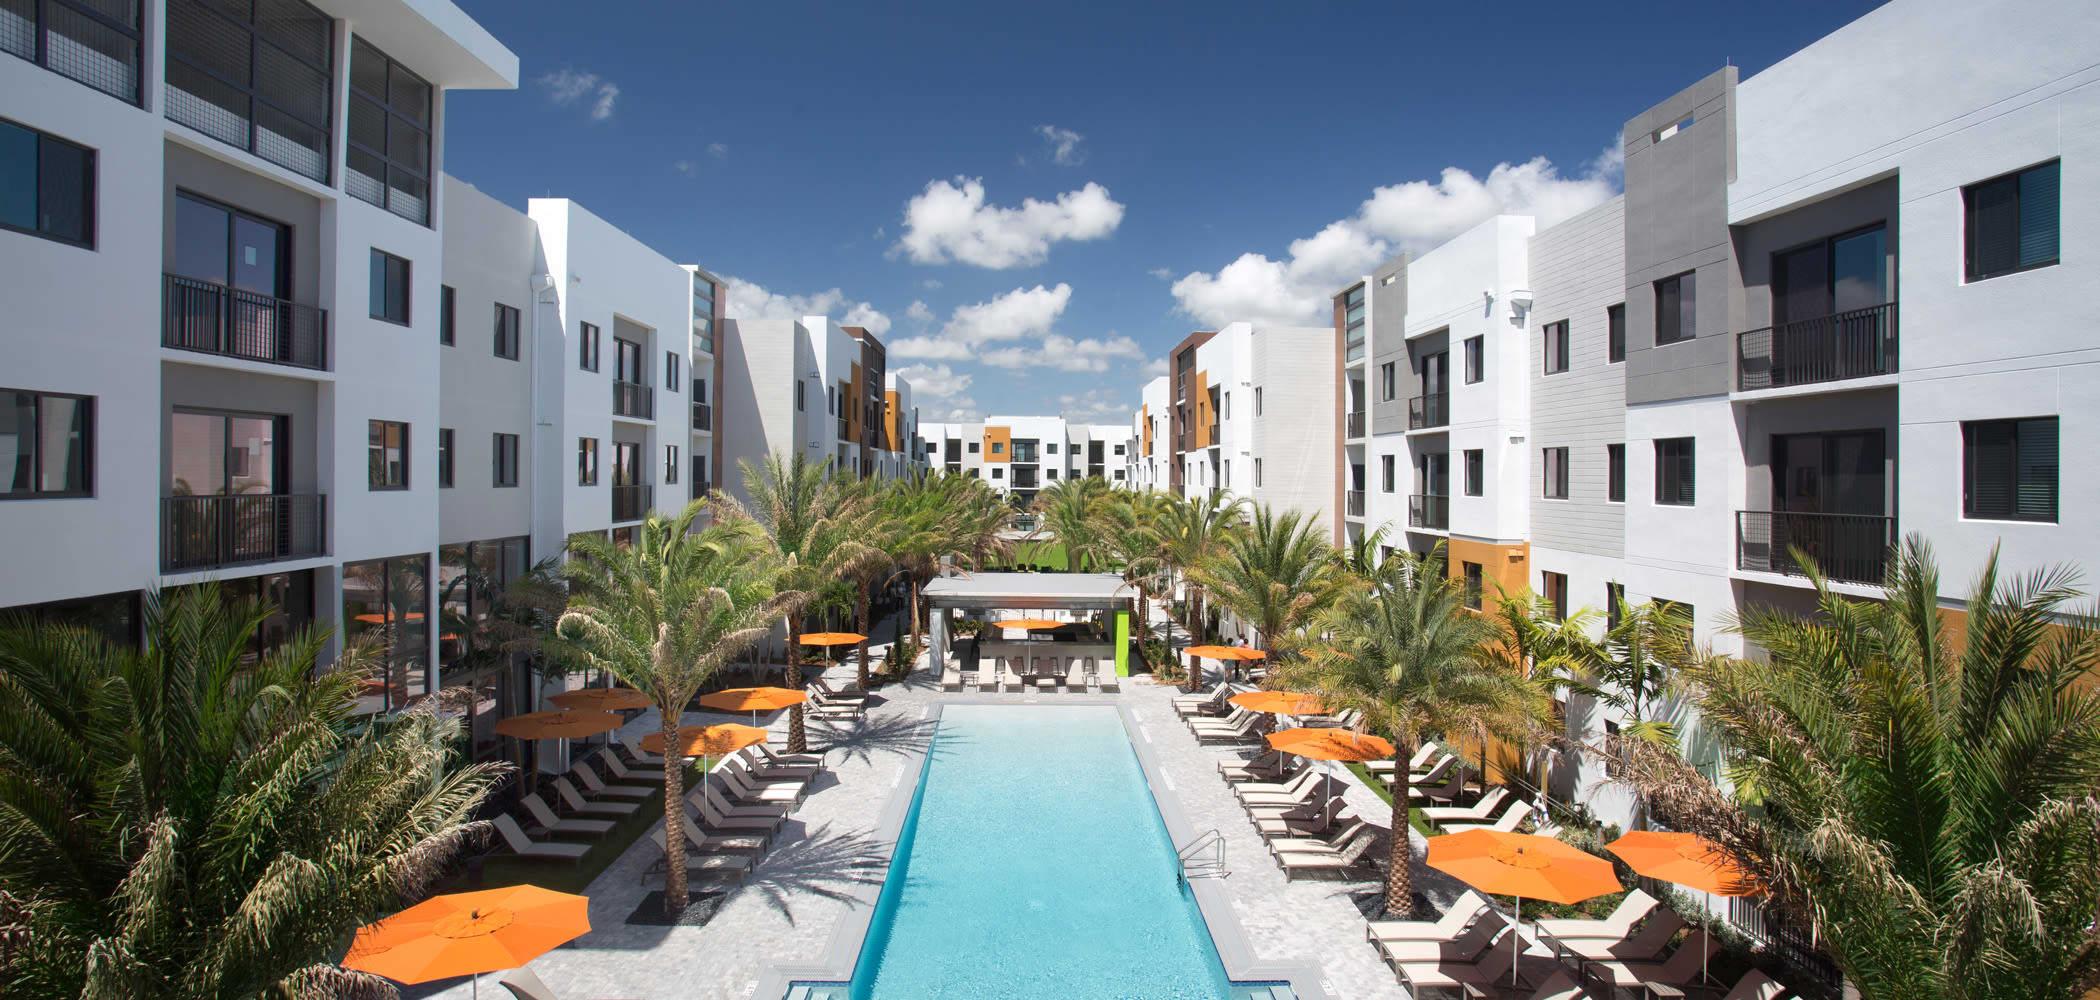 Amazing resort style swimming pool at University Park in Boca Raton, Florida